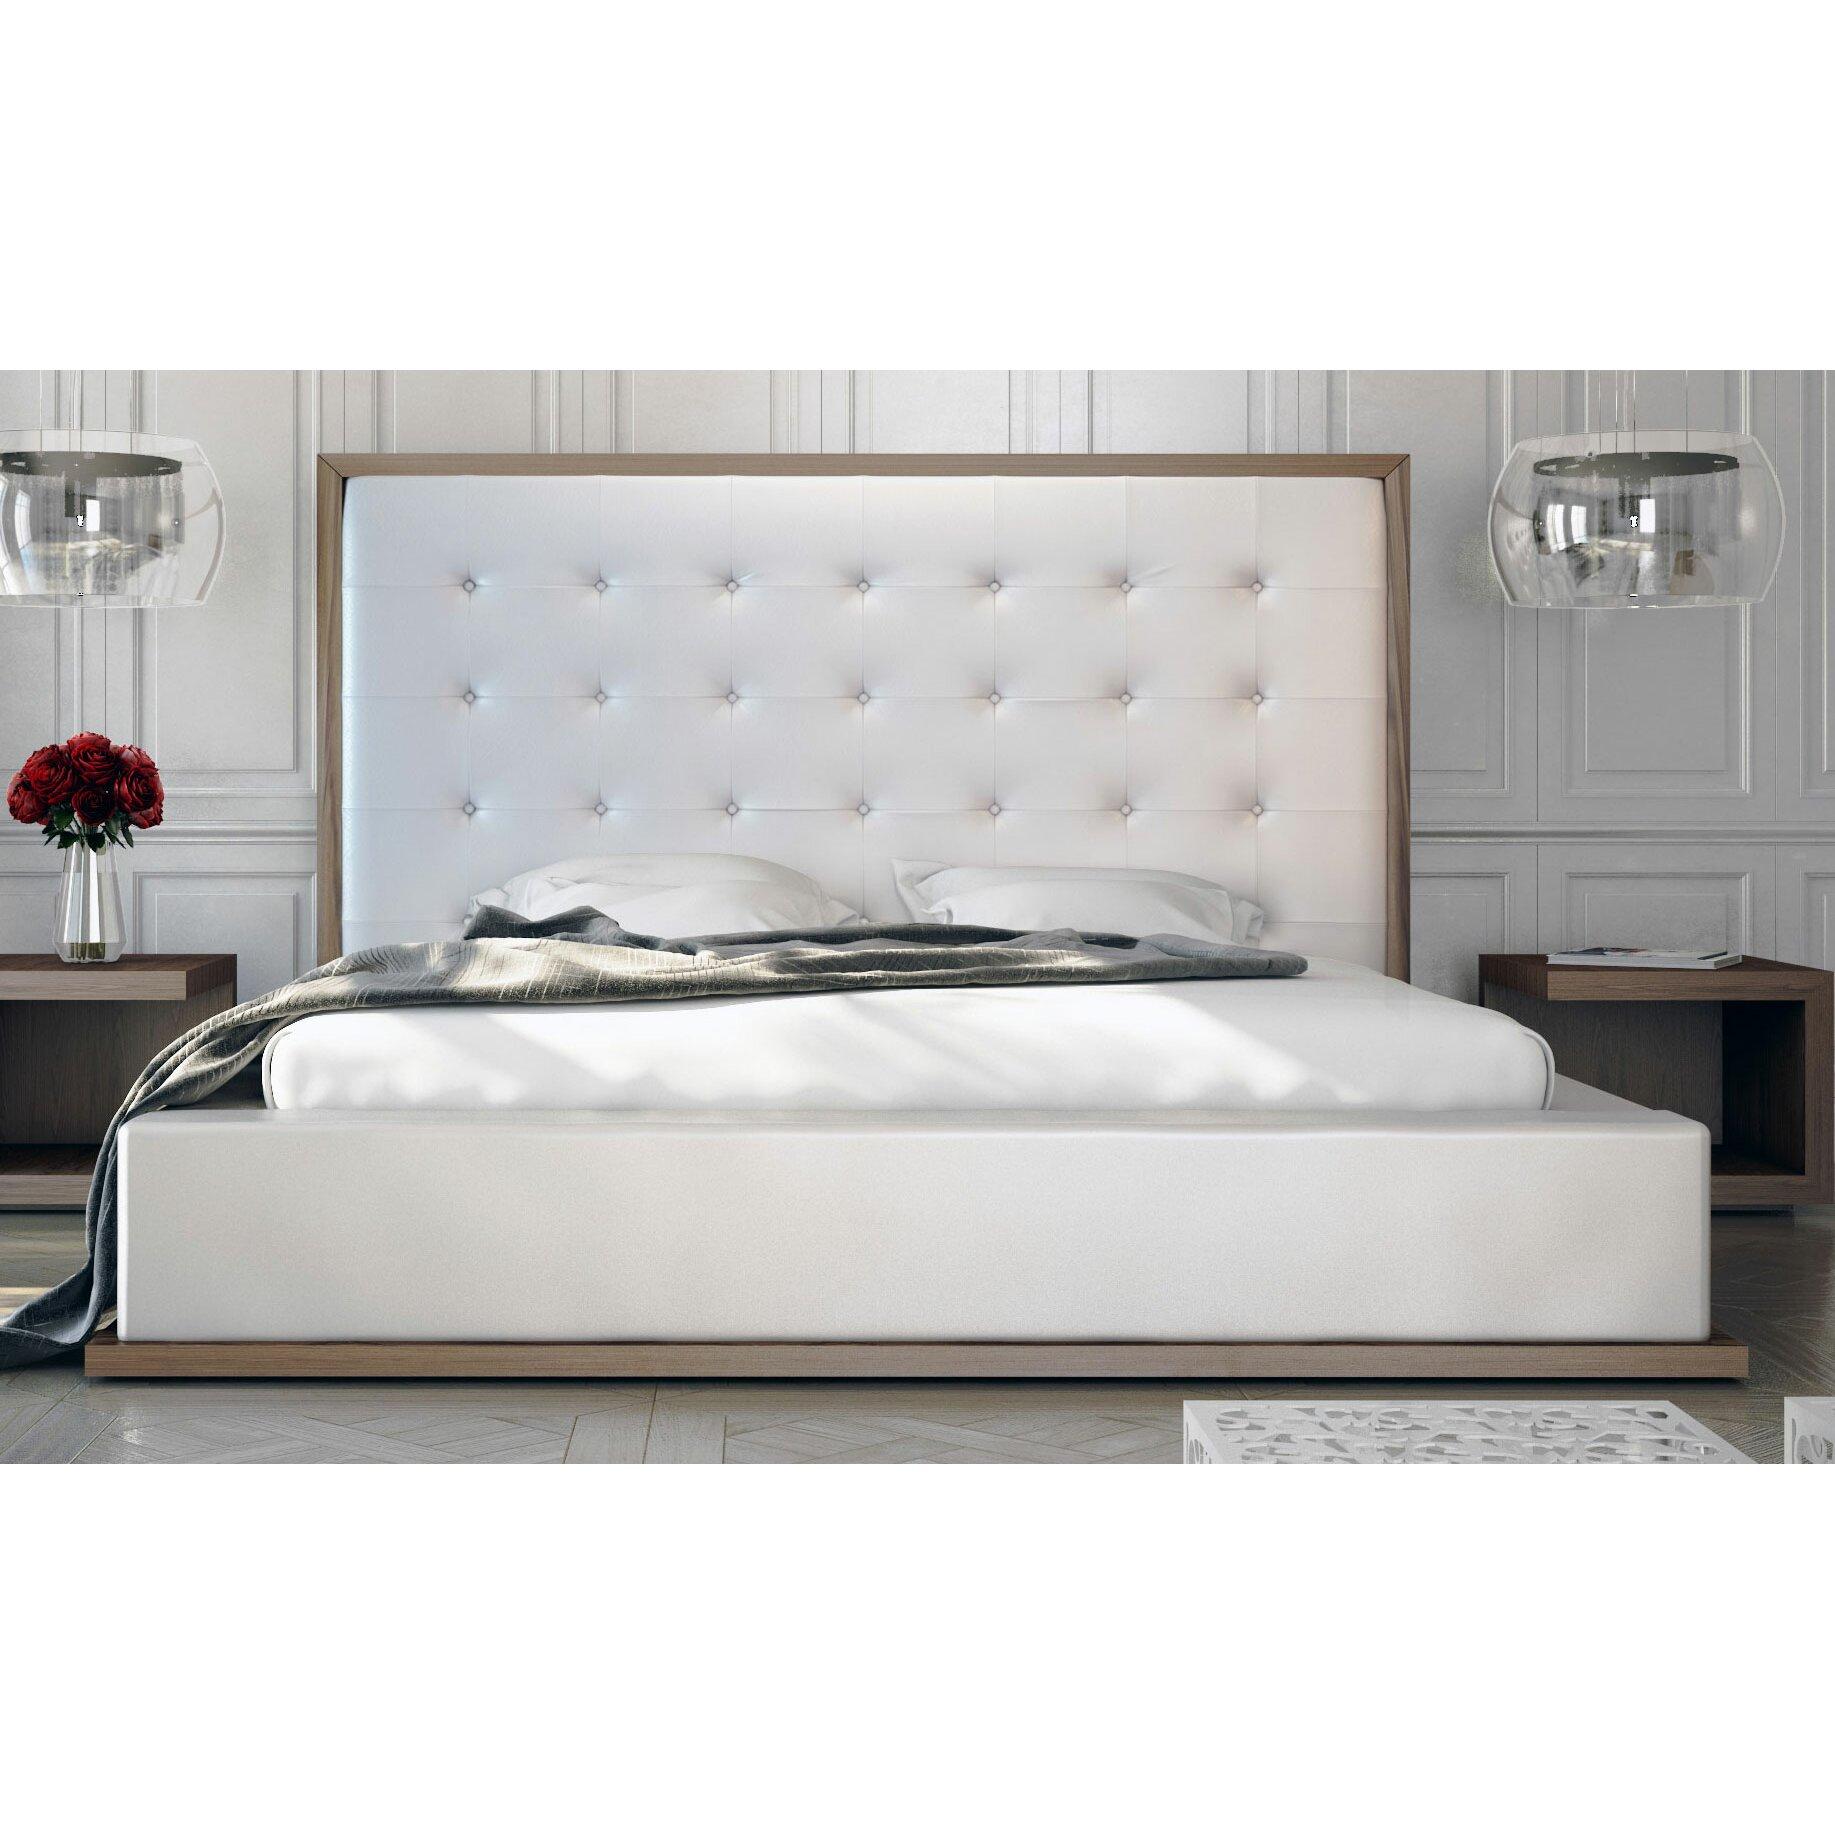 Modloft Ludlow Upholstered Platform Bed Reviews Wayfair